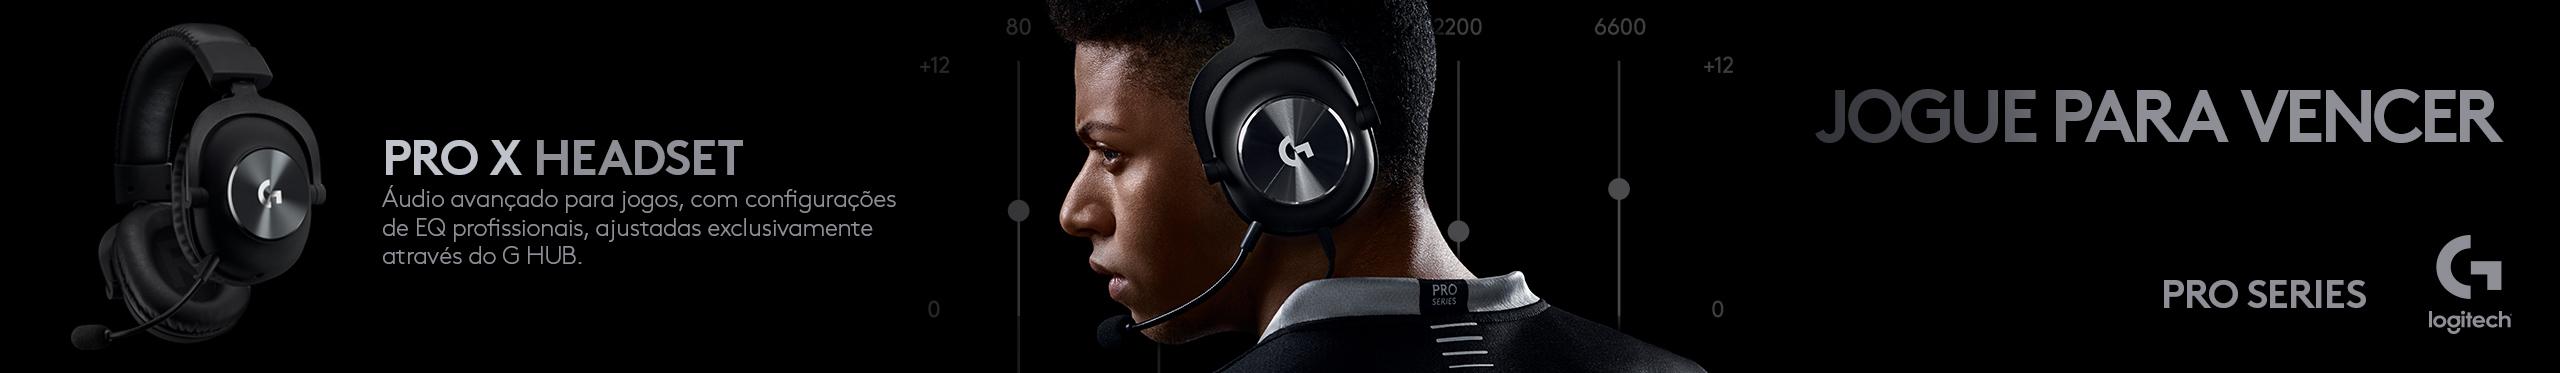 Pro-X Headset